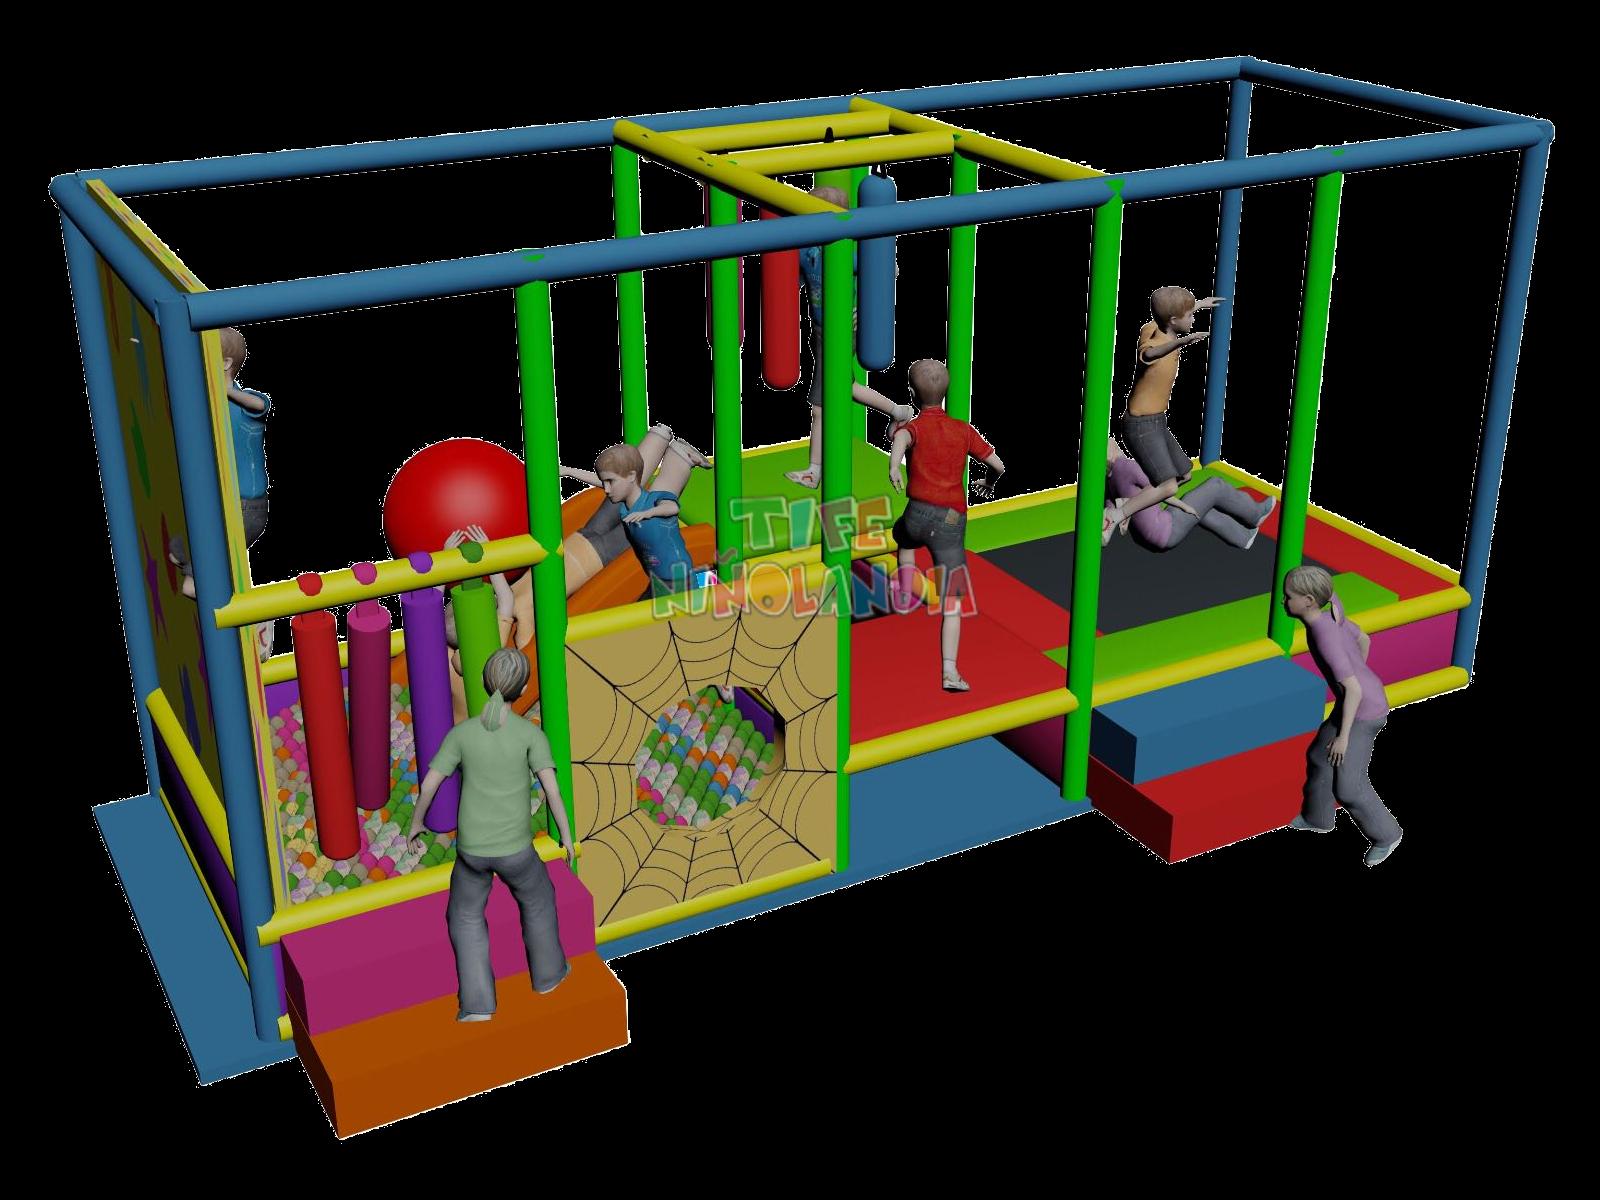 parque infantil tife 1